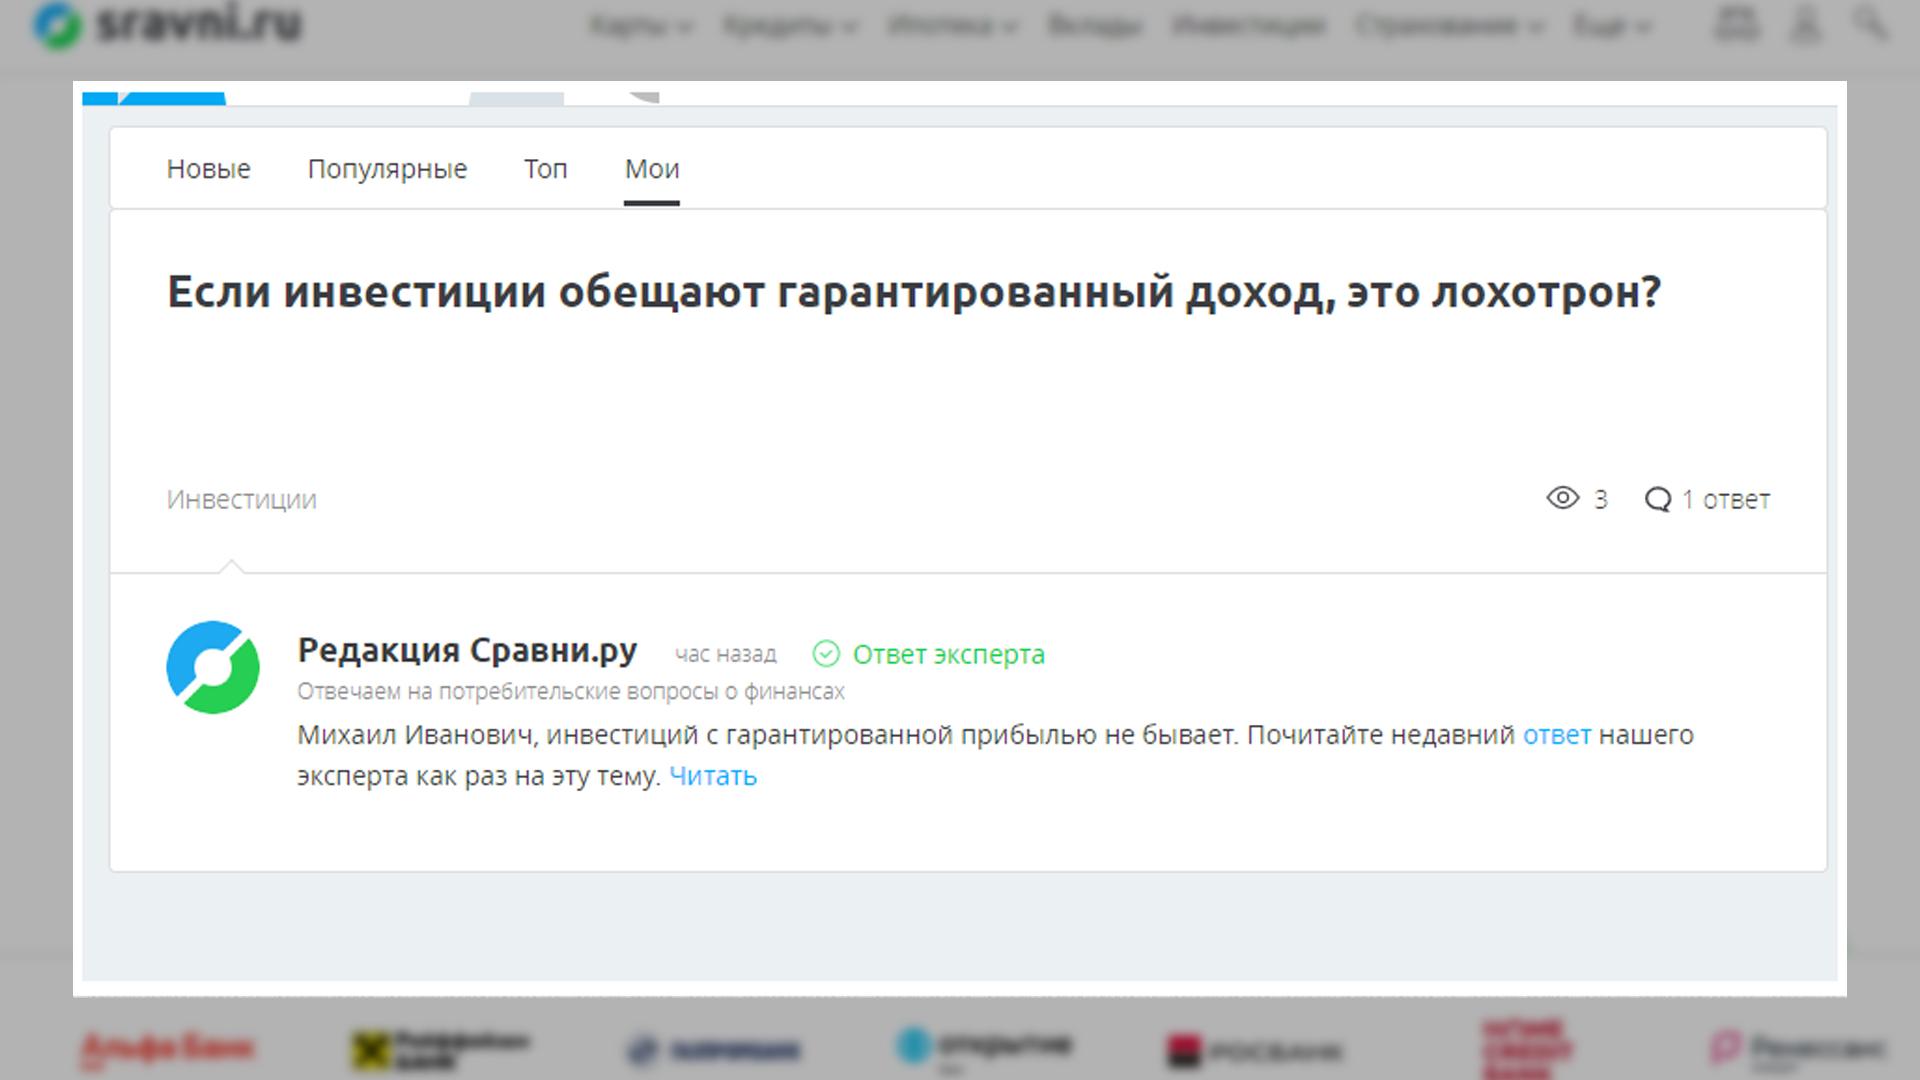 Ответ специалиста компании Сравни.ру на вопрос про инвестиции.